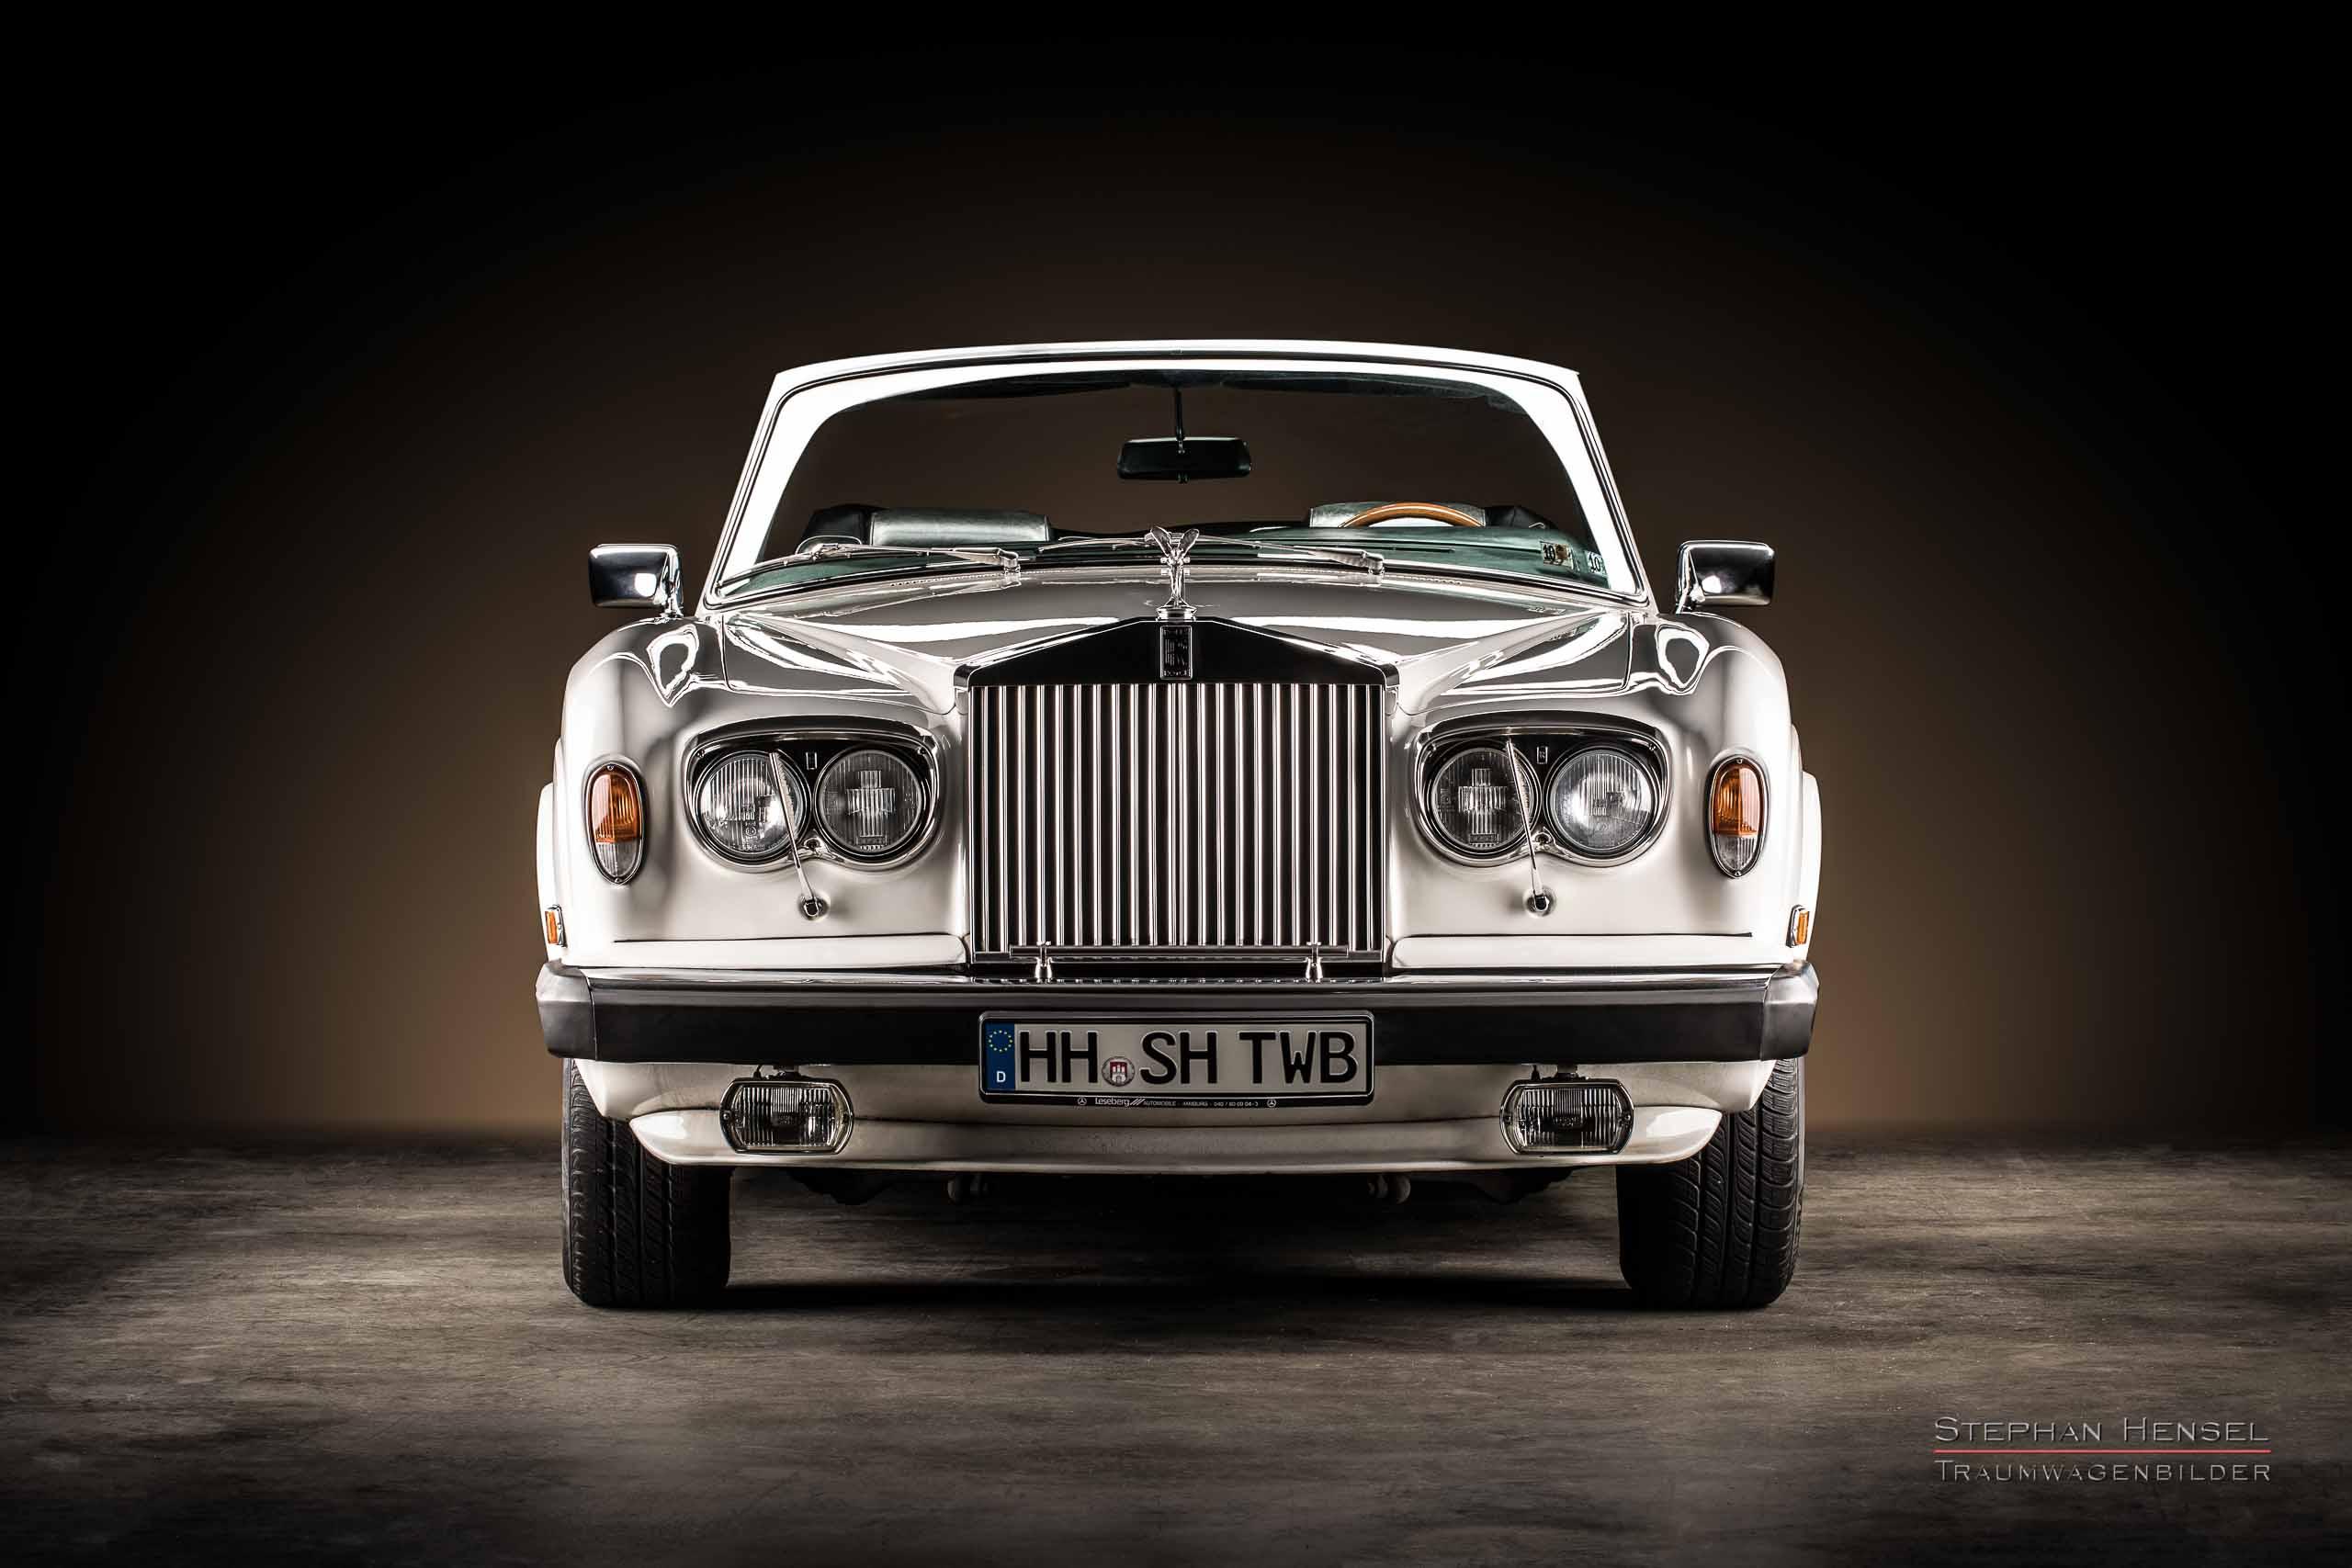 Rolls-Royce Corniche, 1979, Frontalansicht, Autofotograf, Hamburg, Automobilfotograf, Oldtimerfotograf, Oldtimerfotografie, Car Photography, Stephan Hensel